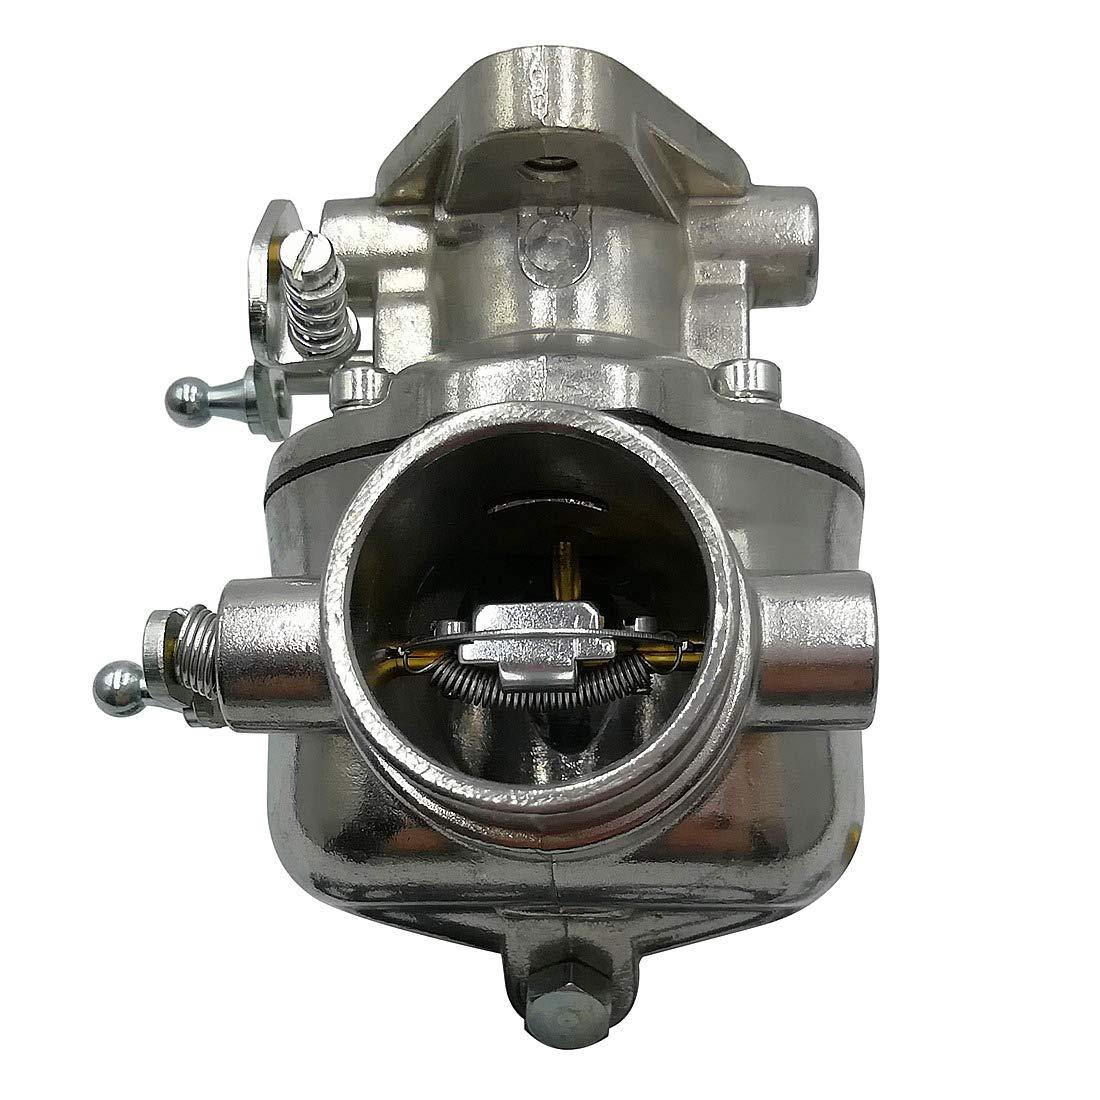 8N9510C Carburetor for Ford Tractor 2N 8N 9N Marvel Schebler Heavy Duty TSX33 TSX241A TSX241B TSX241C Replace 13876 0-13876 B3NN9510A 9N9510A